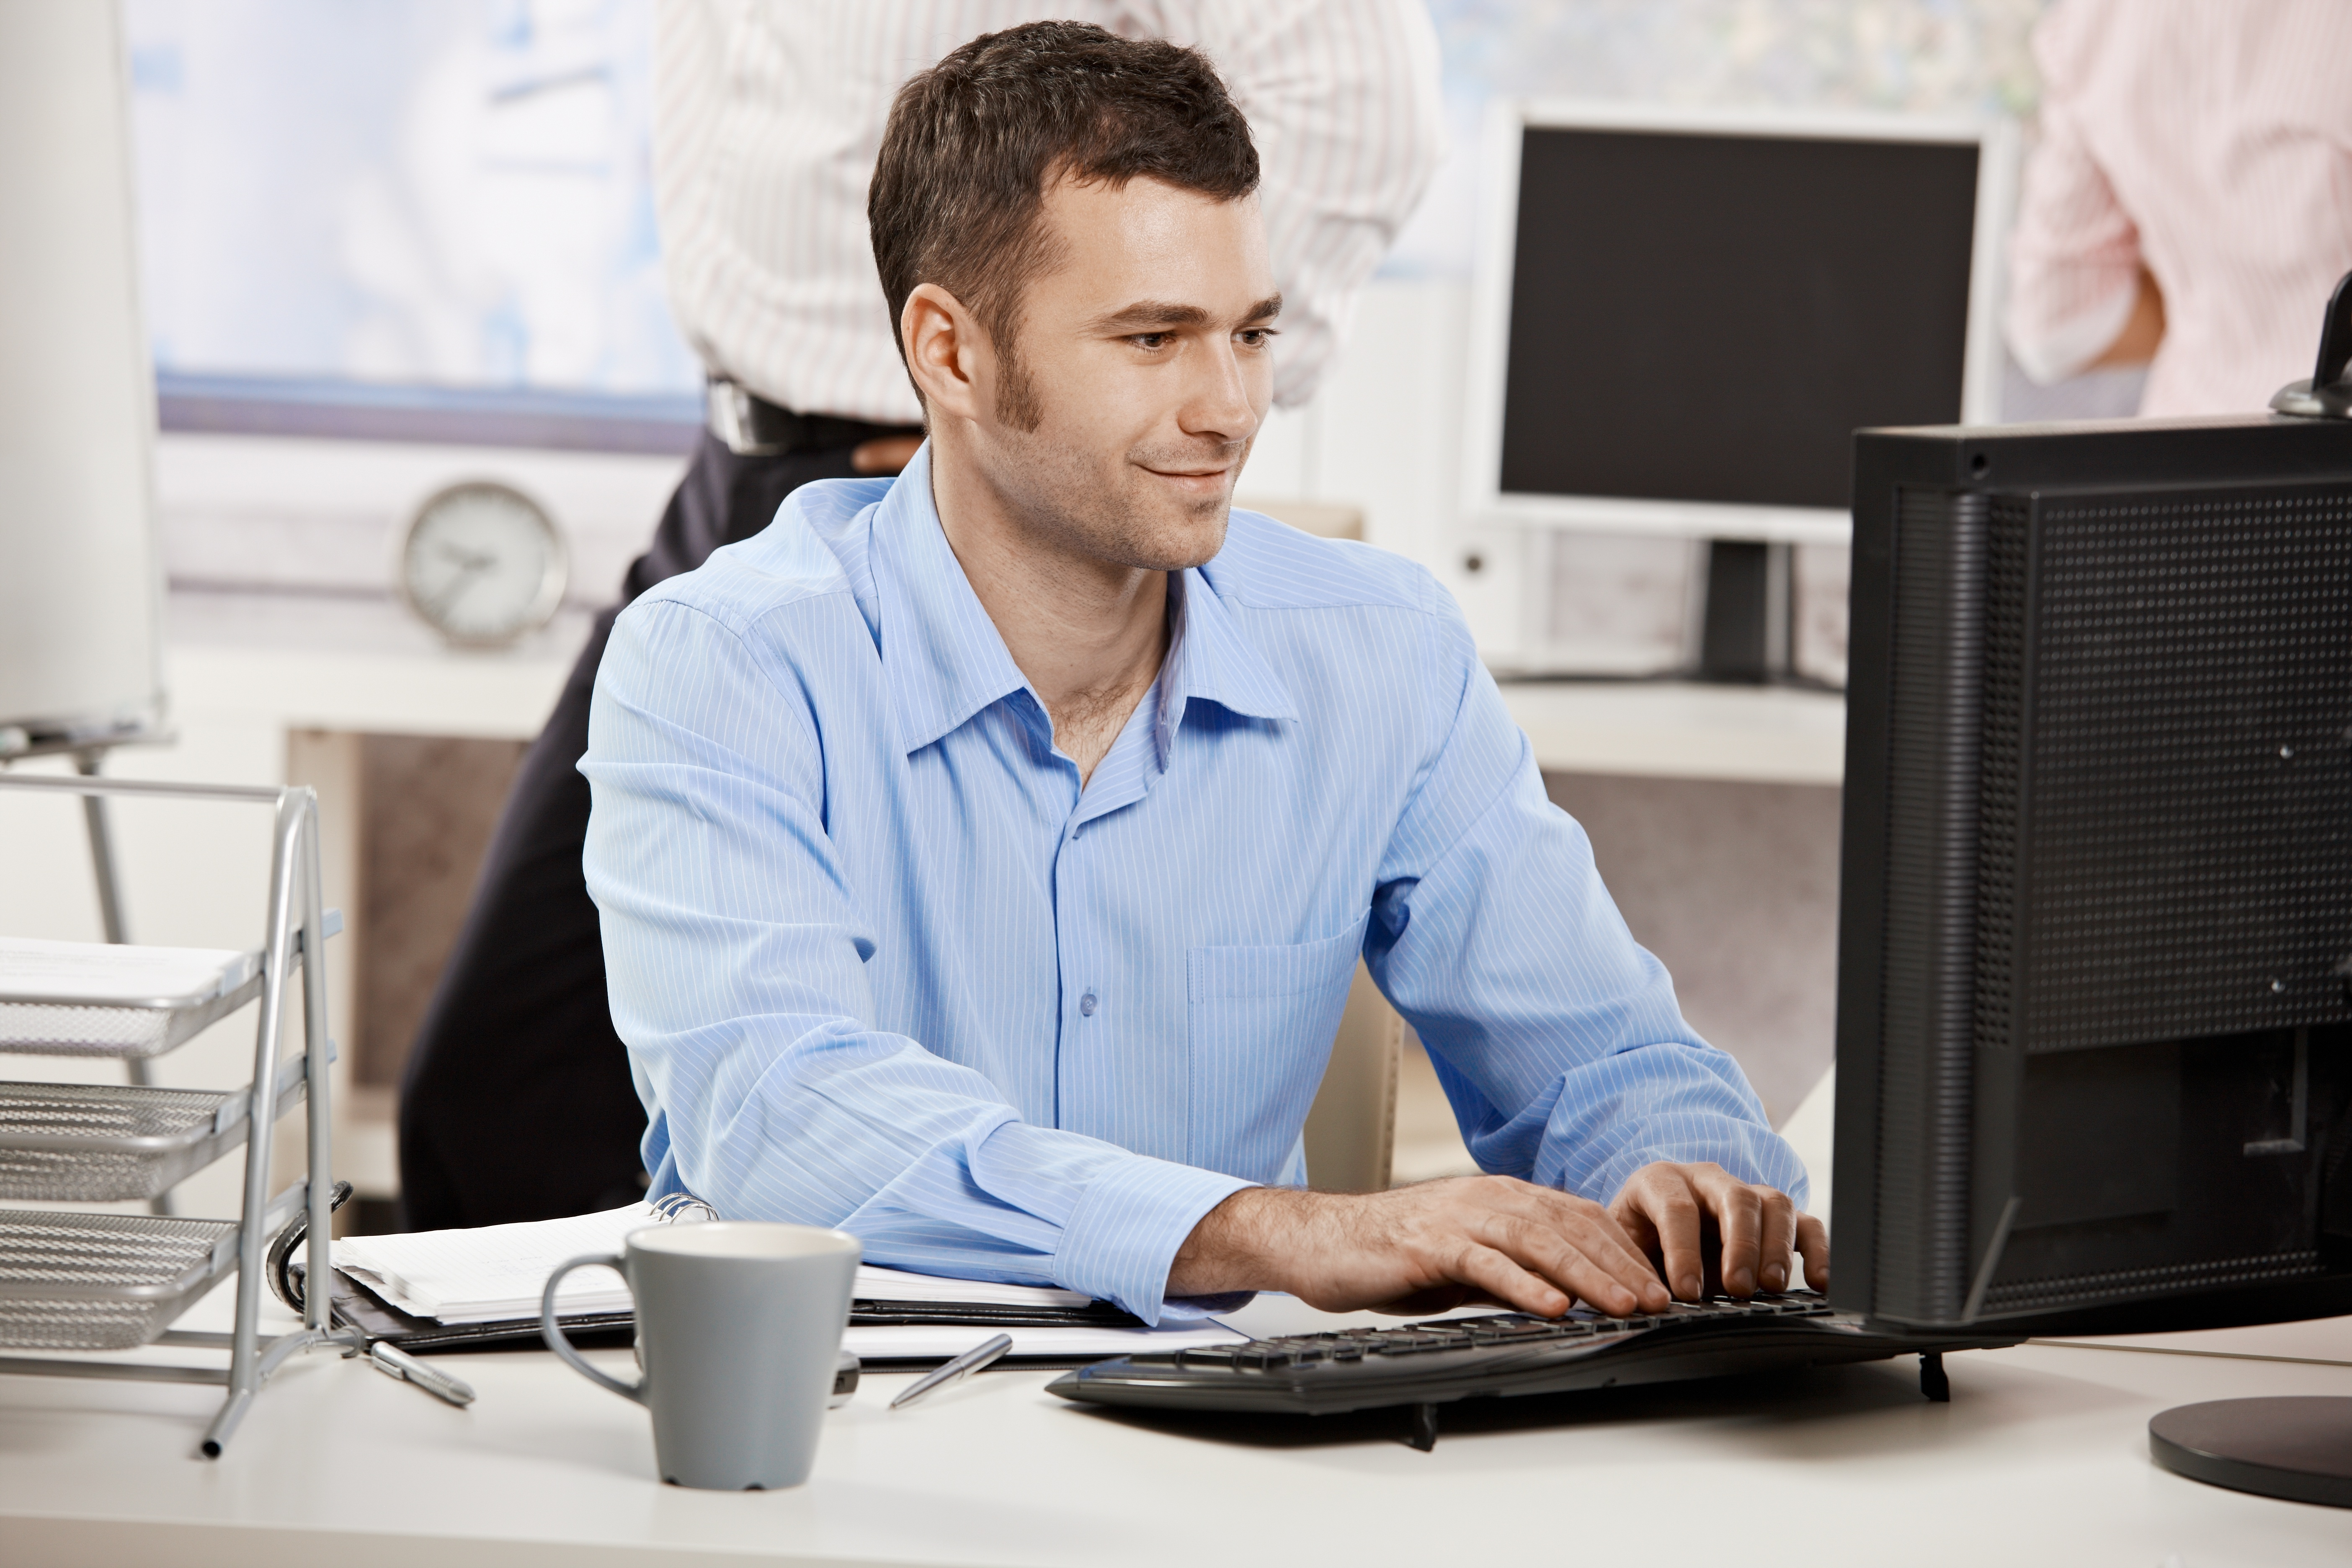 aim-system-ems-online-billing-software-customer-support